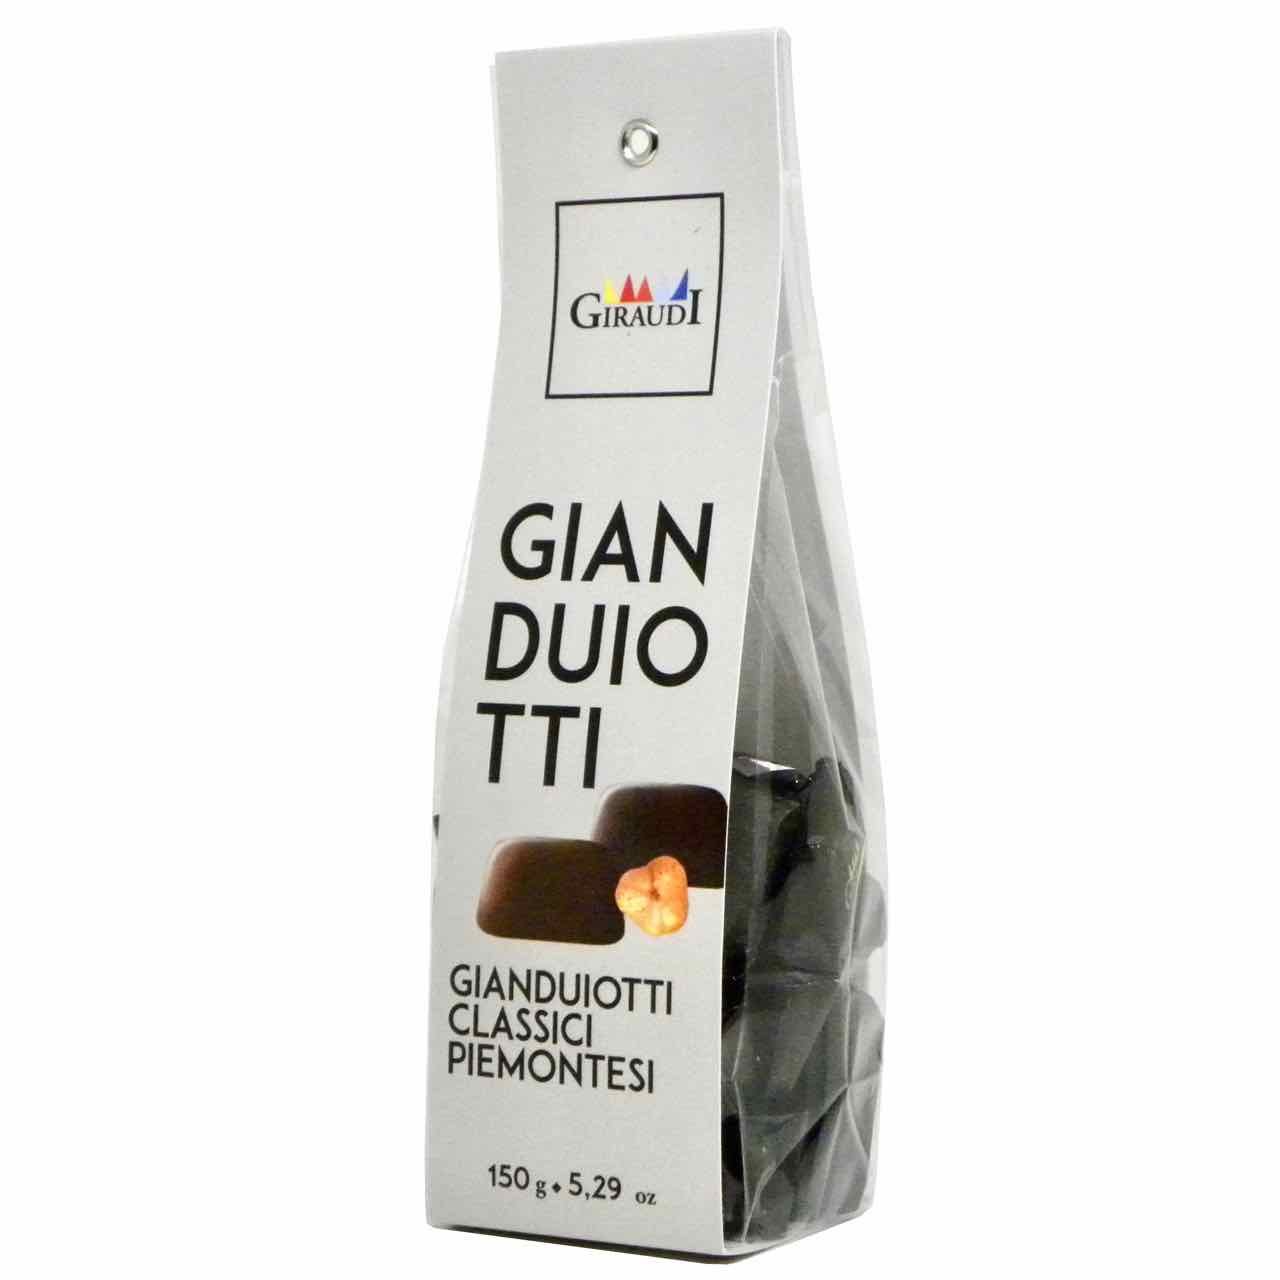 Gianduiotti 4.3 Giraudi lato – Gustorotondo – spesa online –  Gustorotondo online shop – i migliori cibi online – vendita online dei migliori cibi italiani artigianali